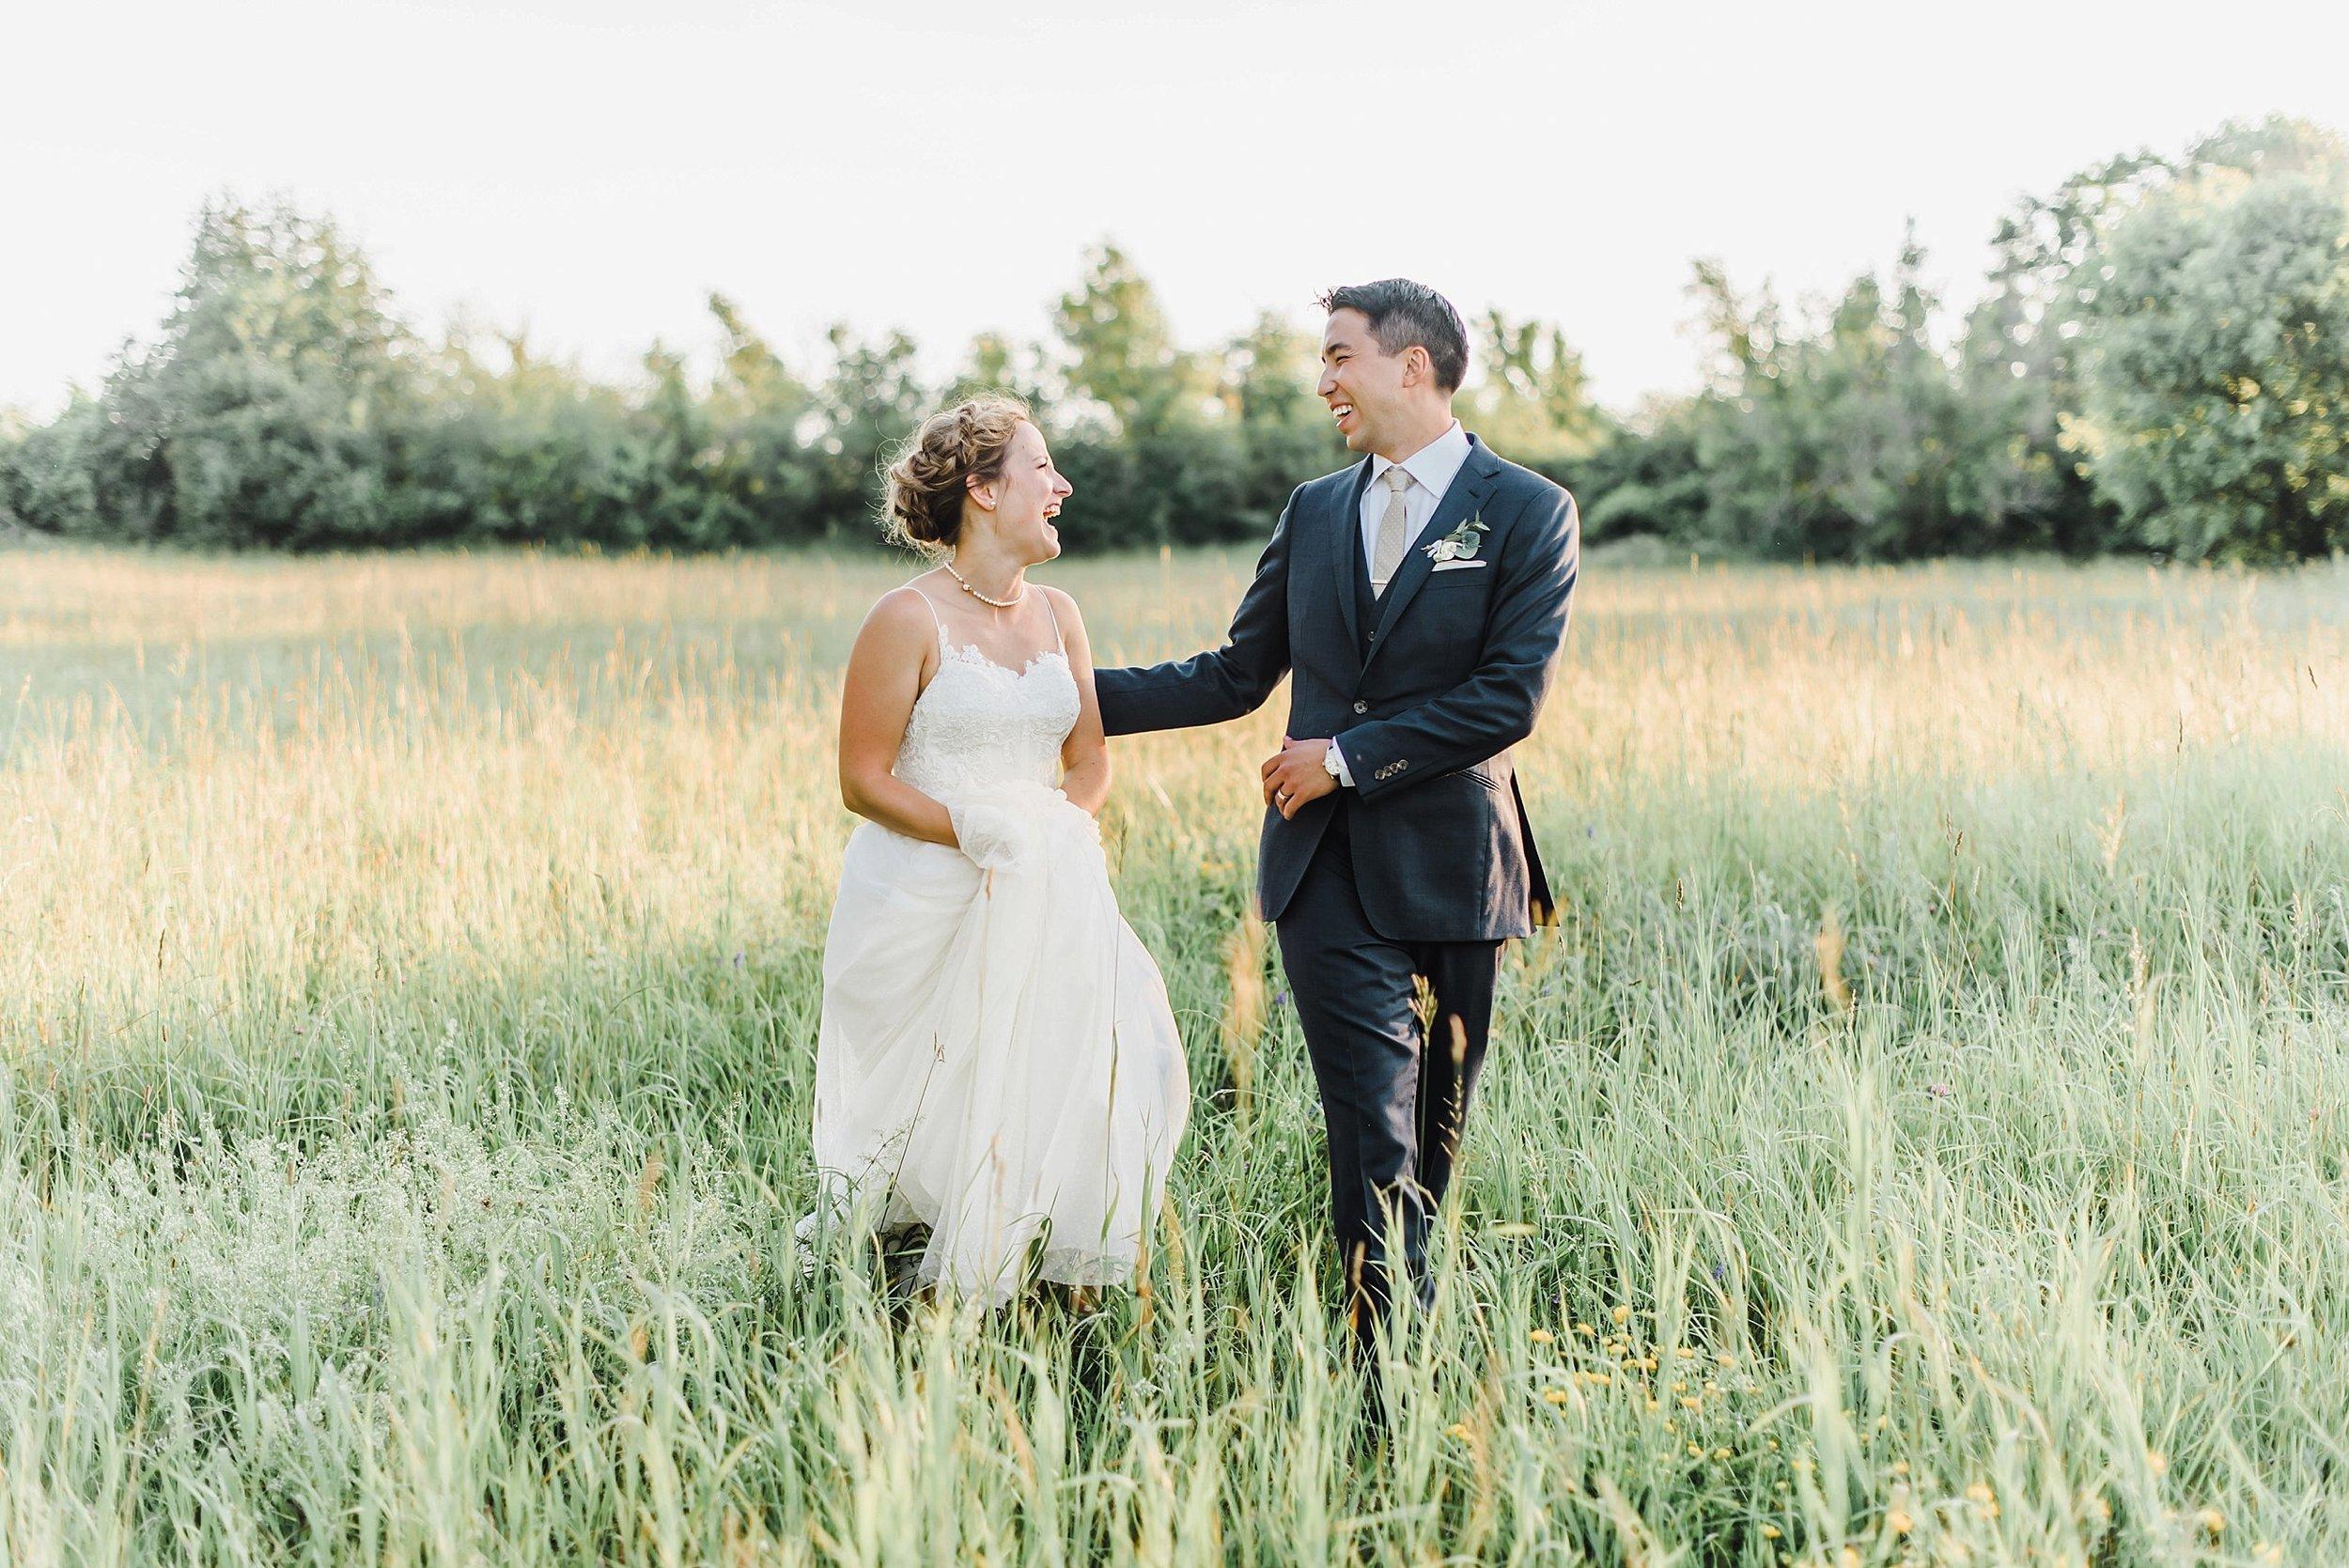 light airy indie fine art ottawa wedding photographer | Ali and Batoul Photography_0902.jpg